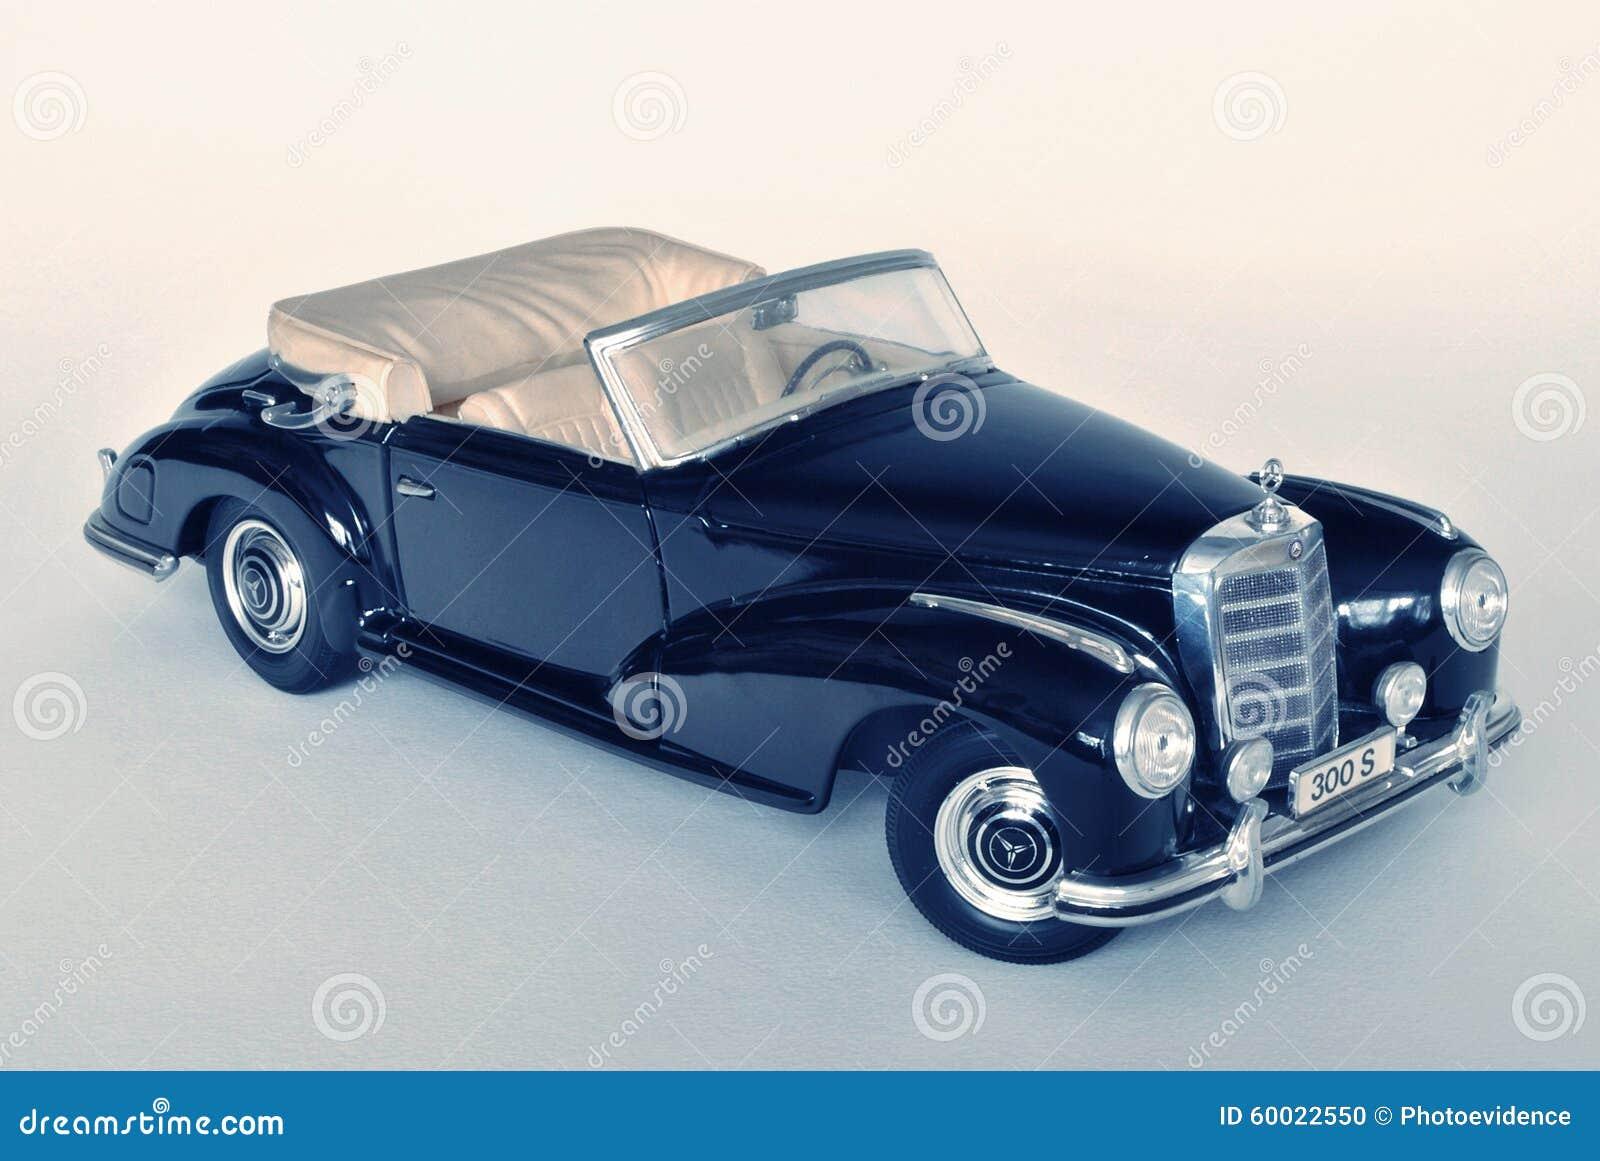 Toy car model mercedes benz 300s 1955 editorial image for Mercedes benz toy car models